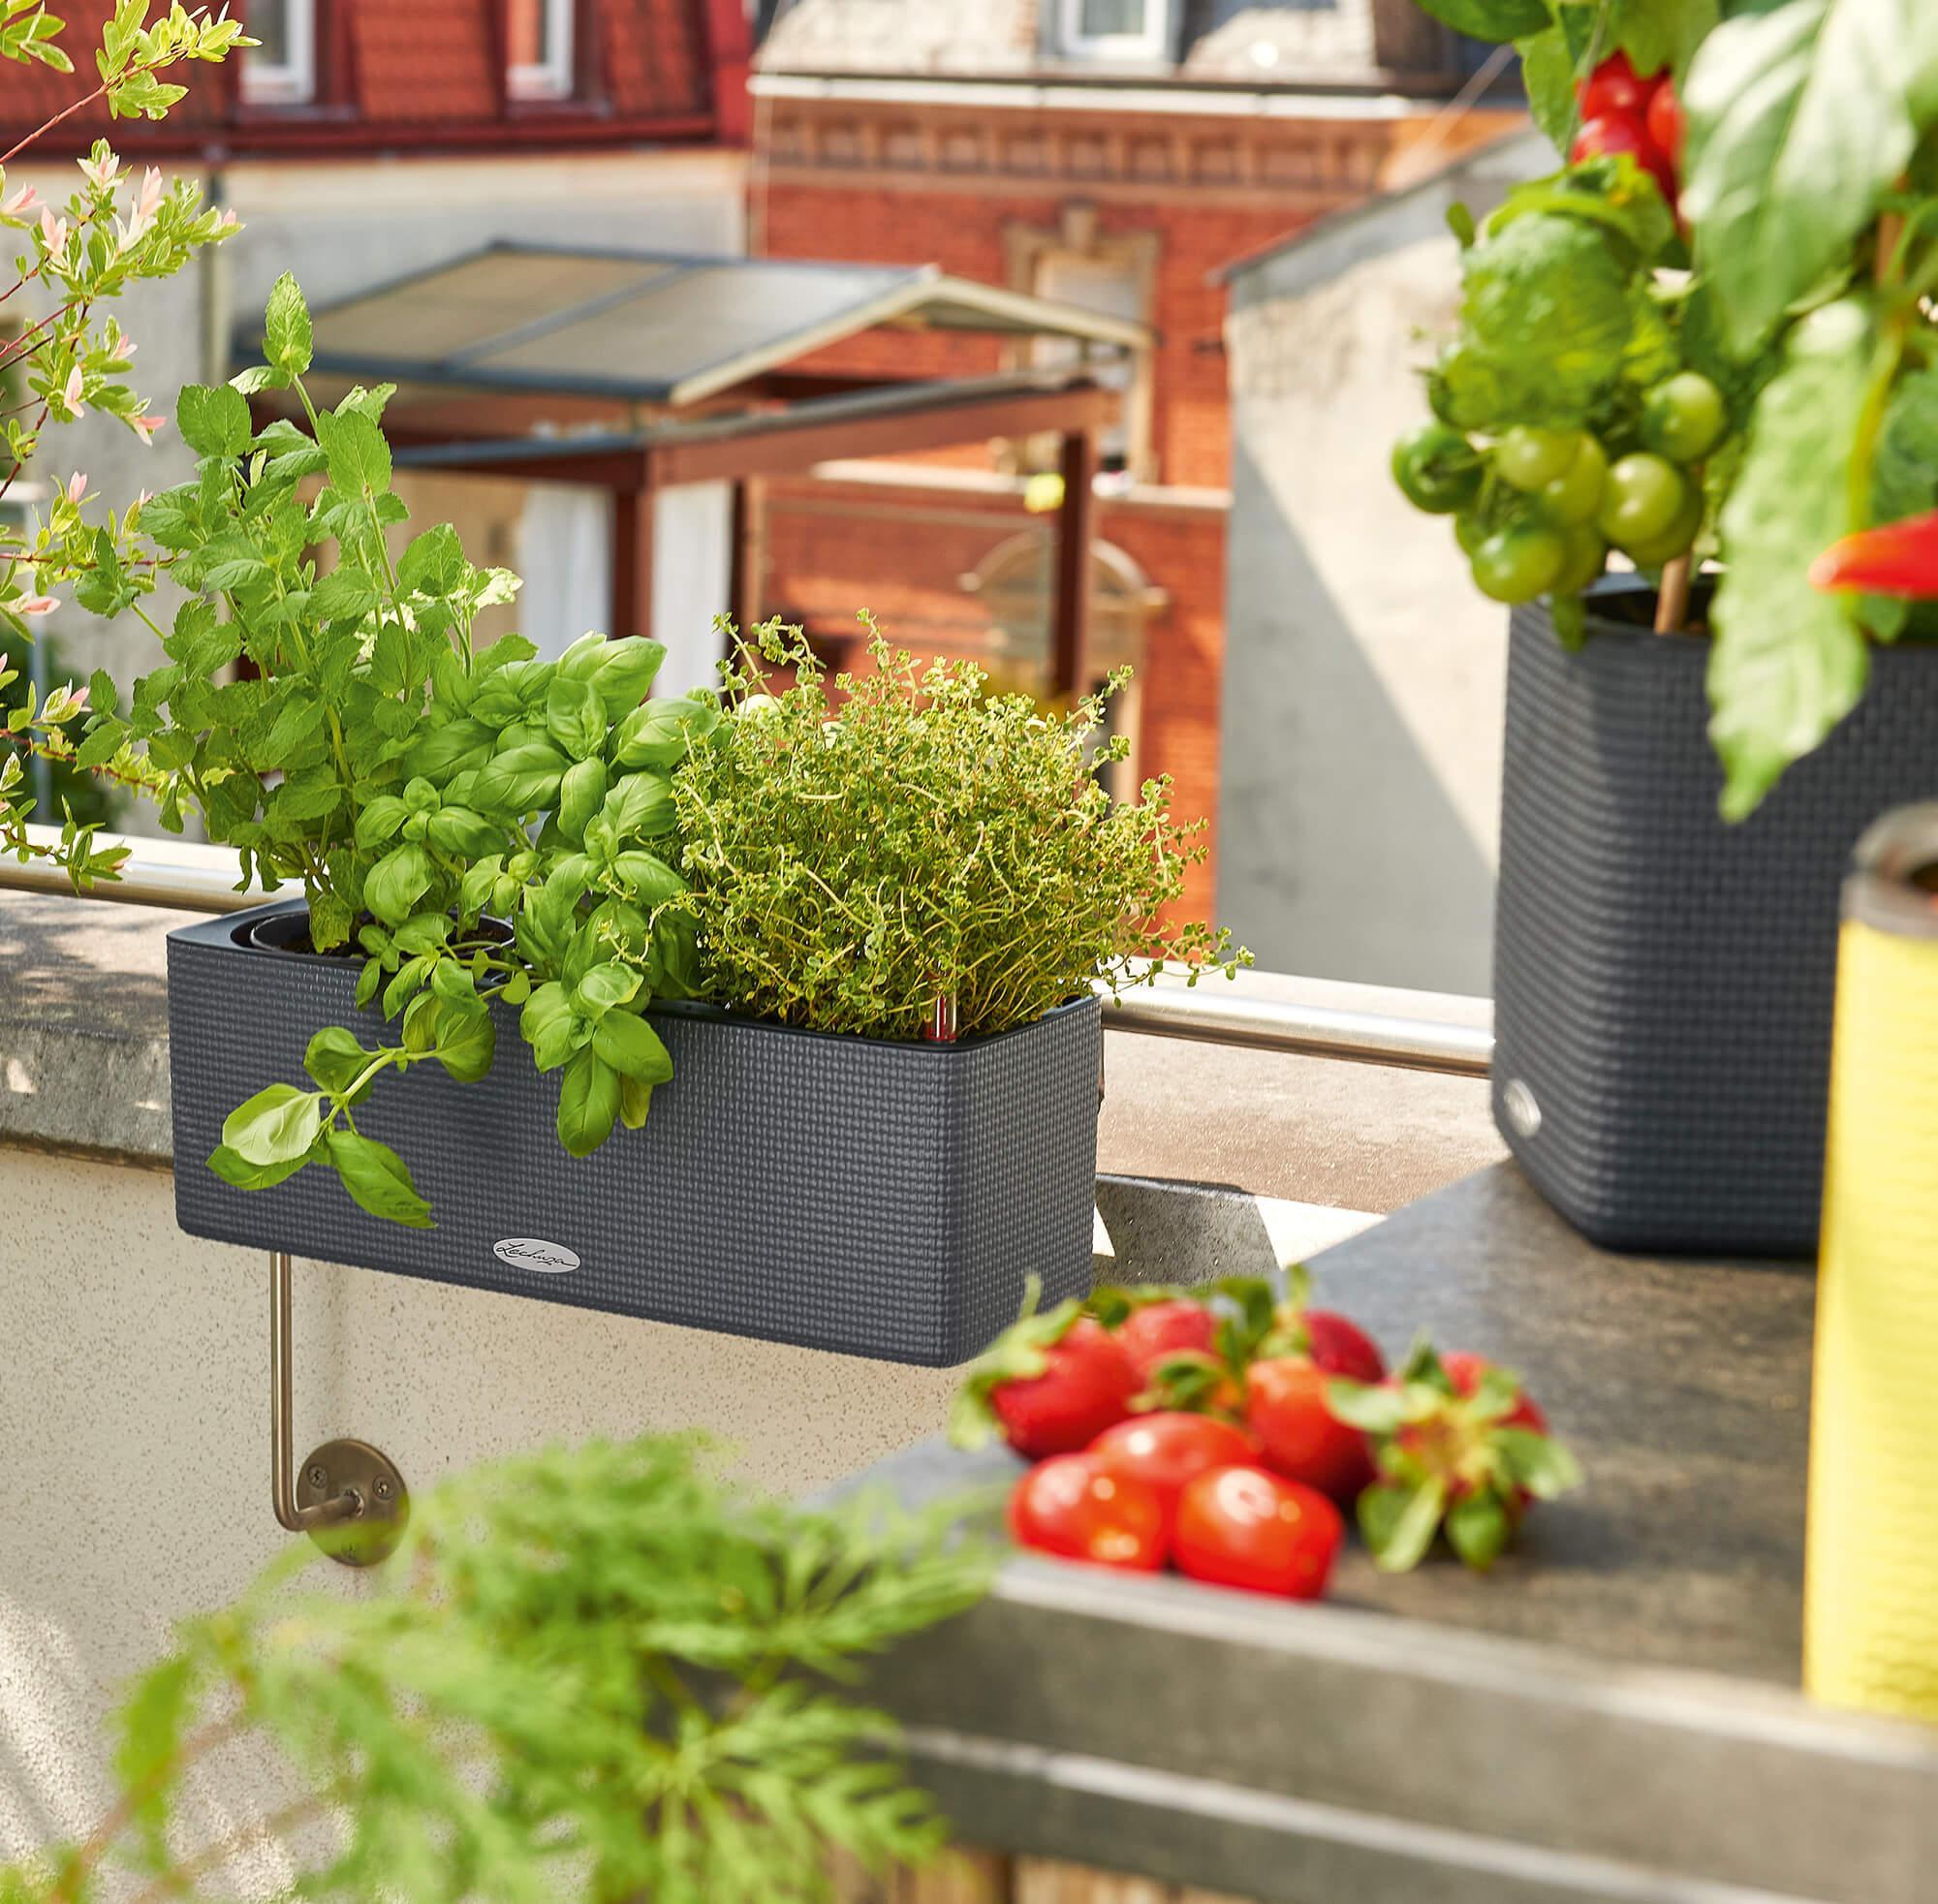 le_tw-urban-gardening_balconissima_gr